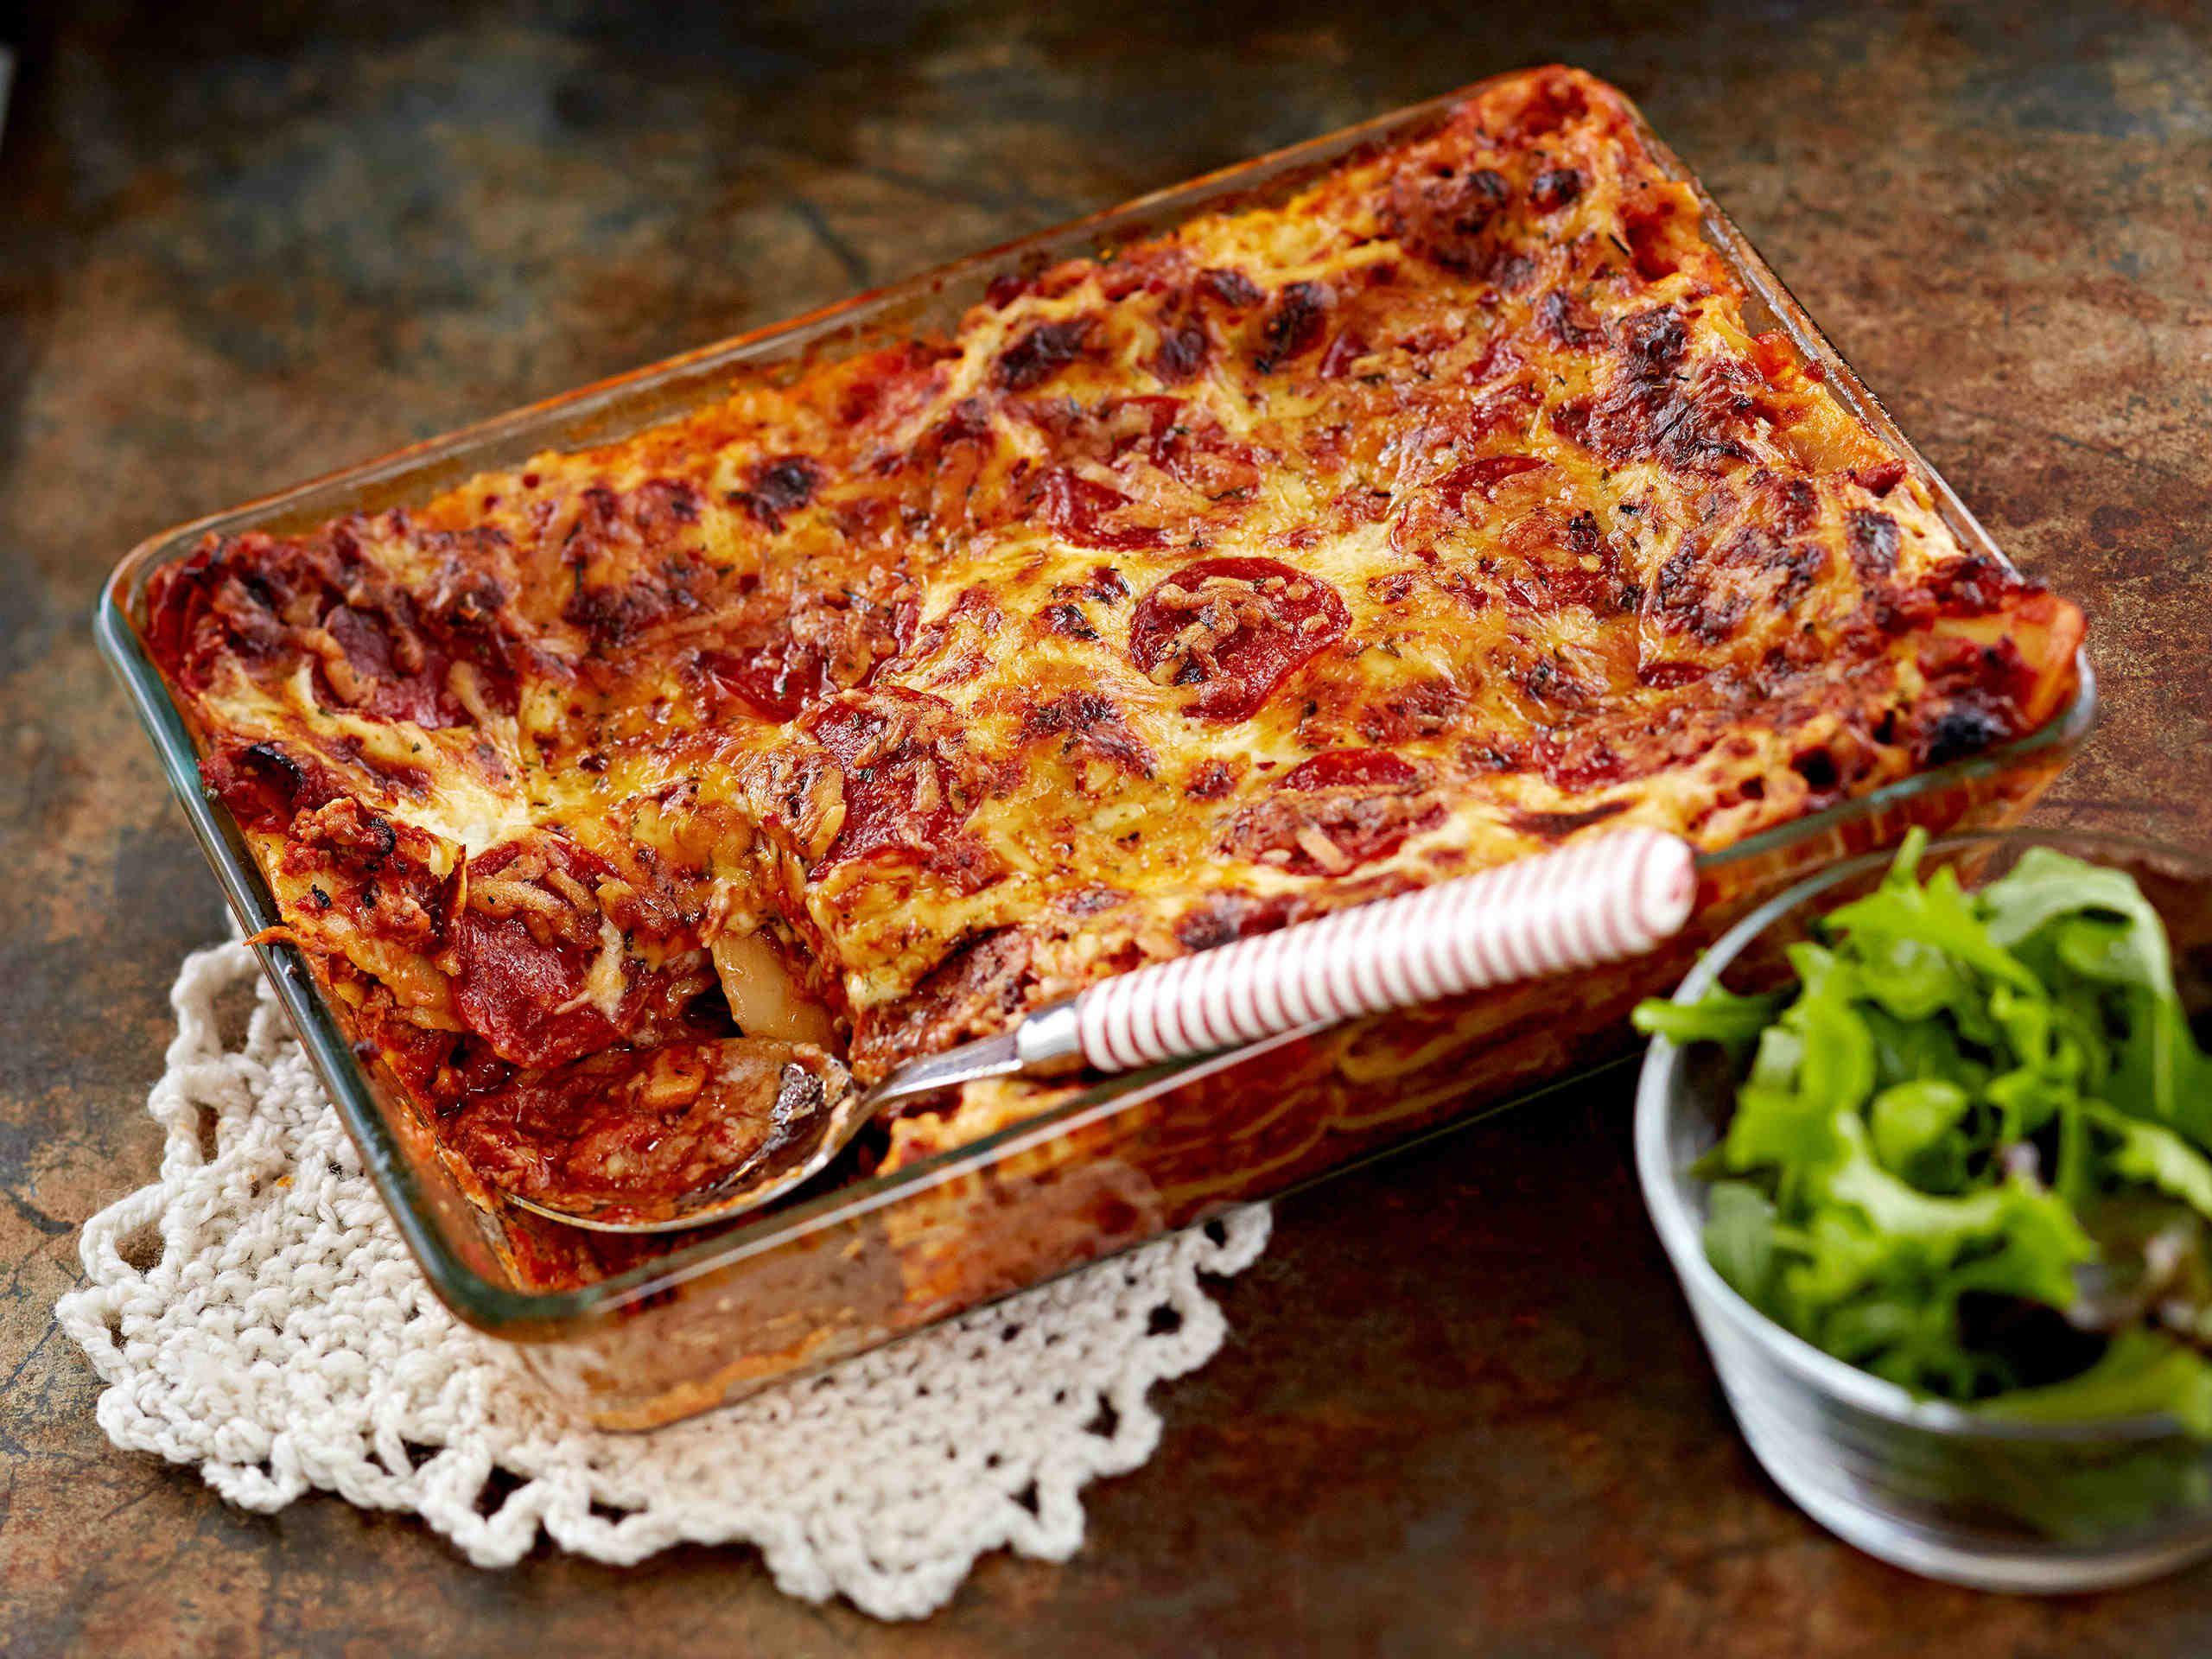 Pepperonilasagne on mehukas klassikko. Lasagnen juustokastike saa uutta potkua texmex-mausteesta ja -juustosta. Pepperonilasagne maistuu raikkaan salaatin kera.